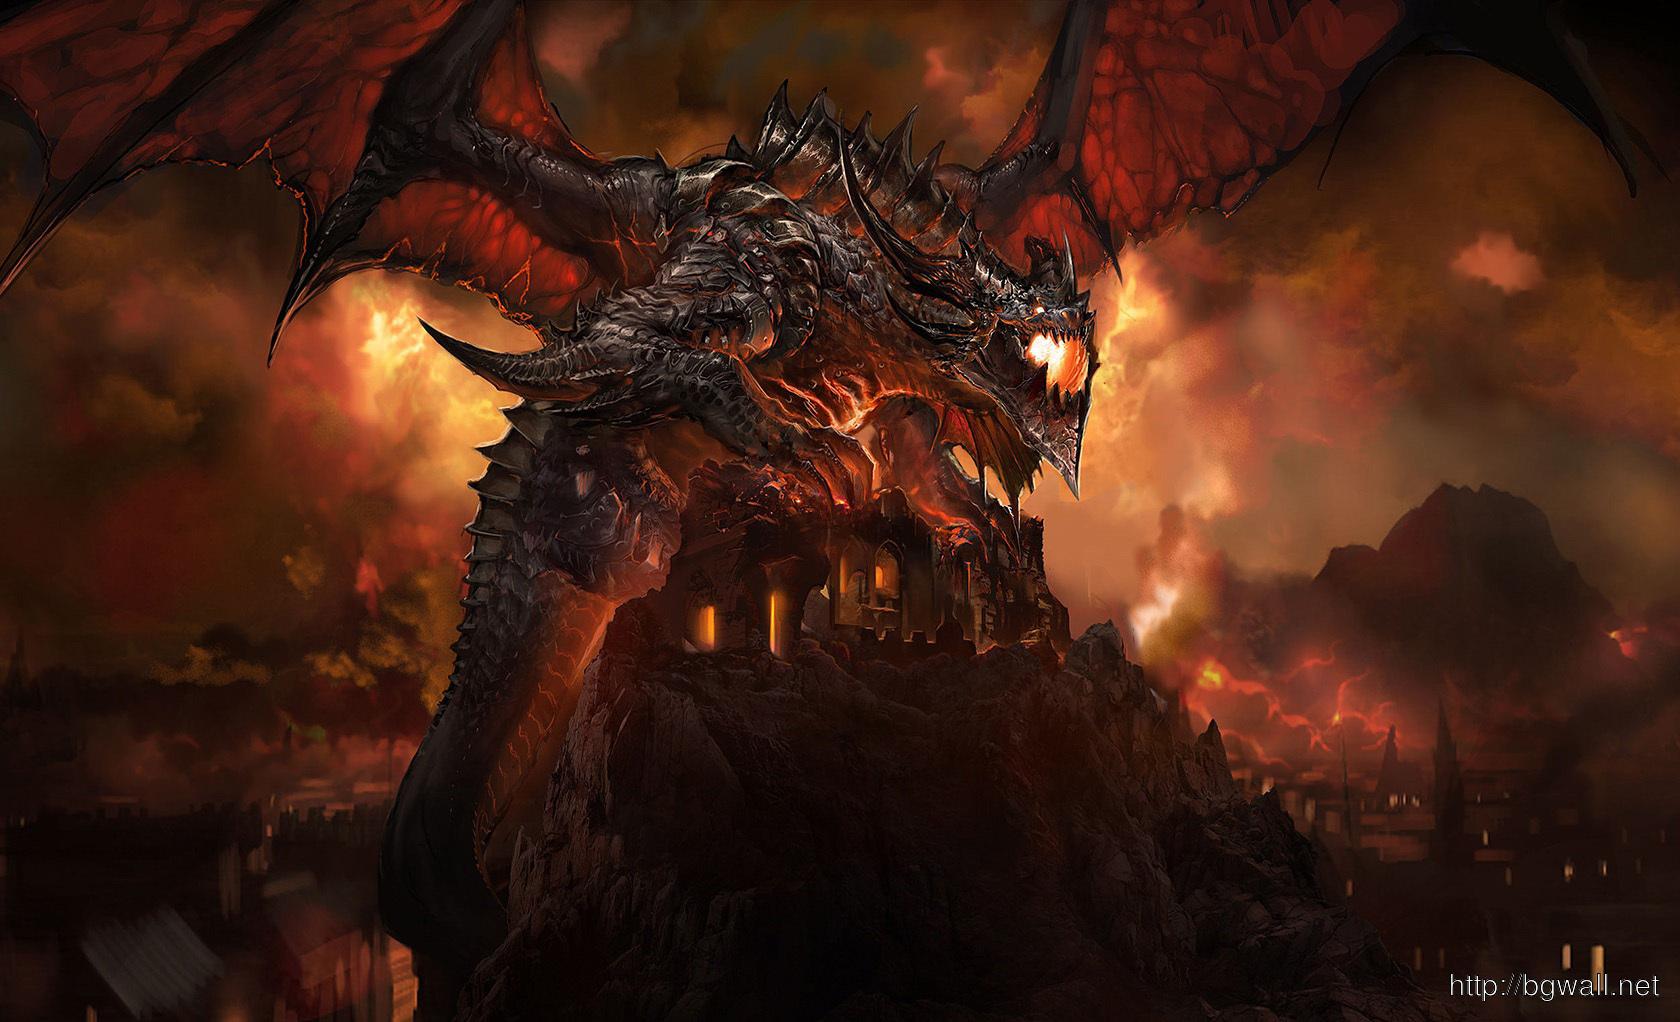 miscellaneous fire dragon picture - photo #38